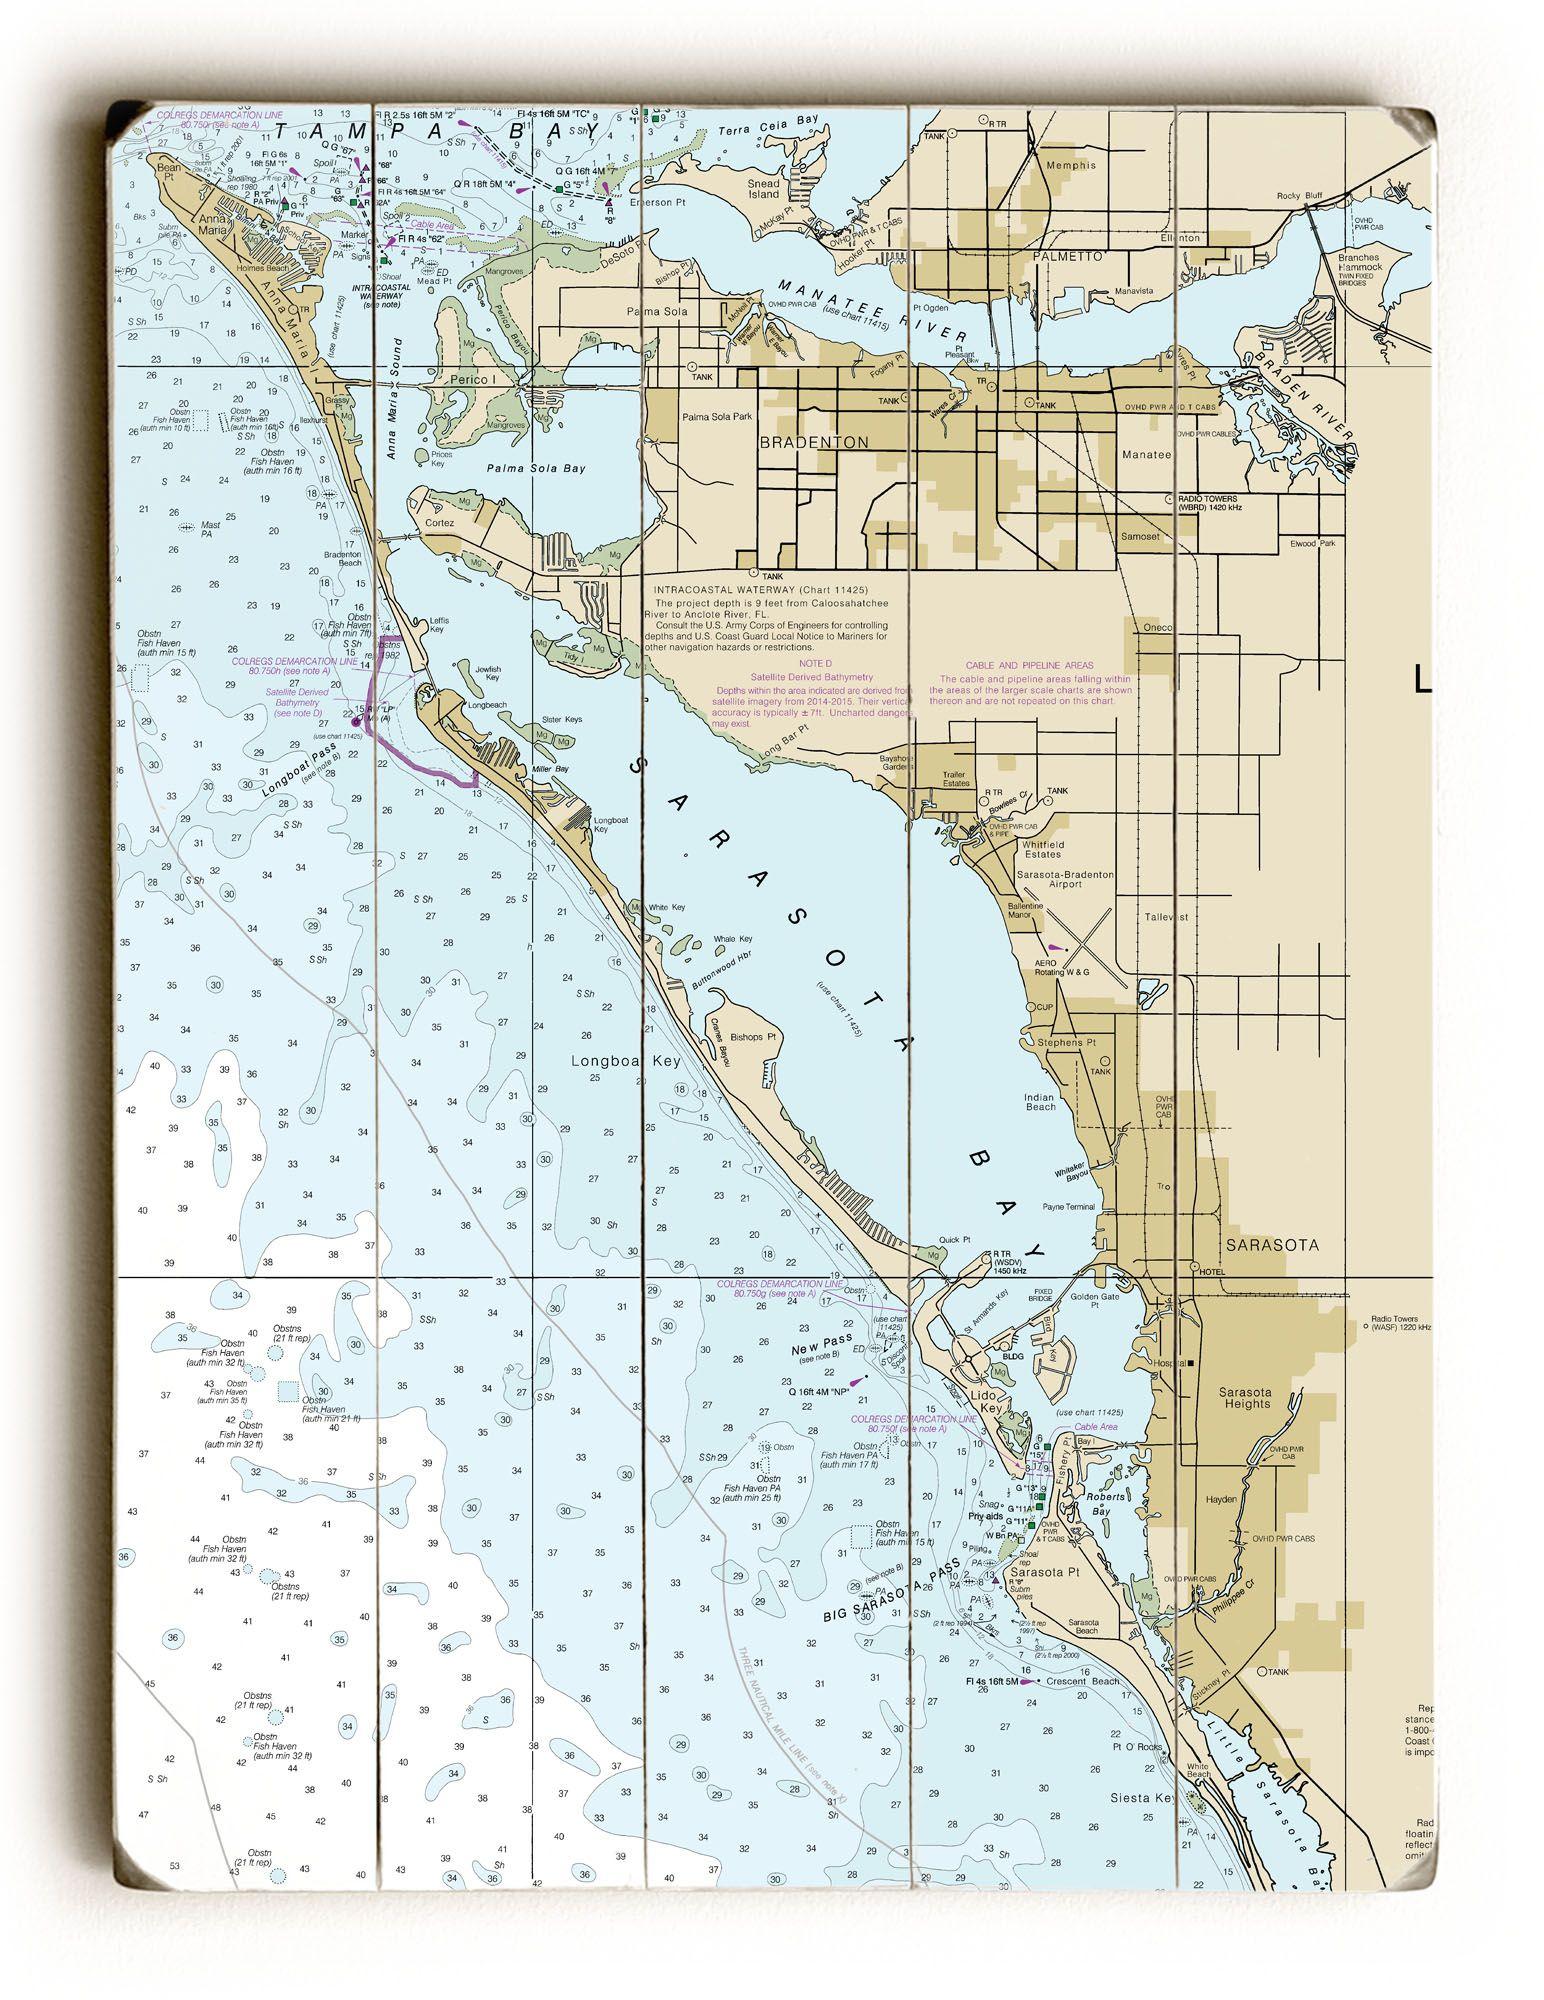 topographic map sarasota county Fl Bradenton Sarasota Fl Nautical Chart Sign Nautical Chart